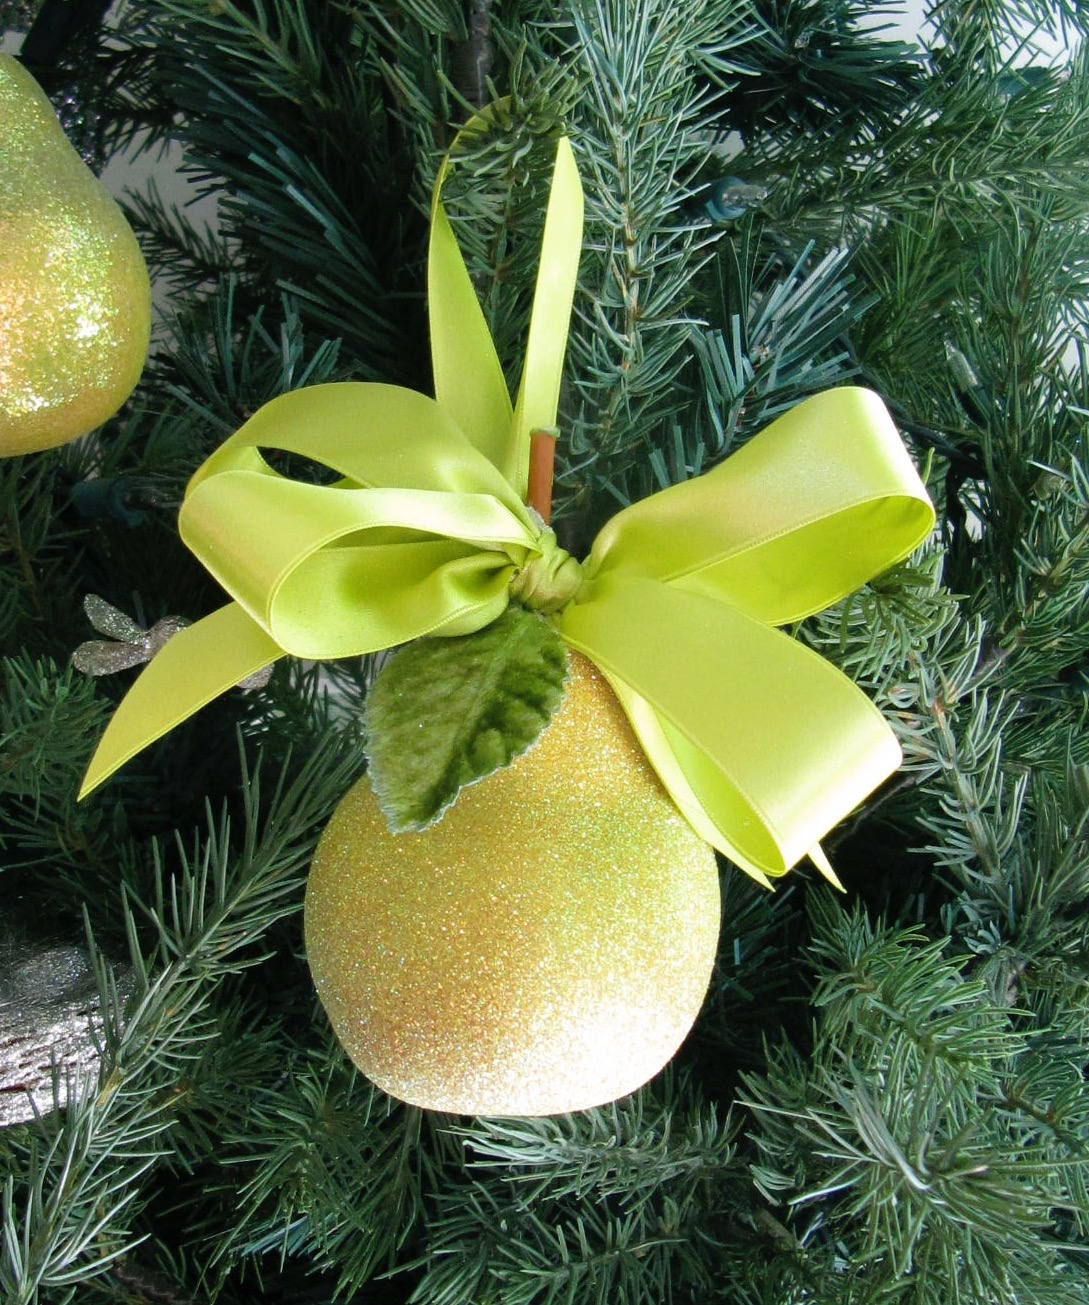 Chartreuse Pear Ornament